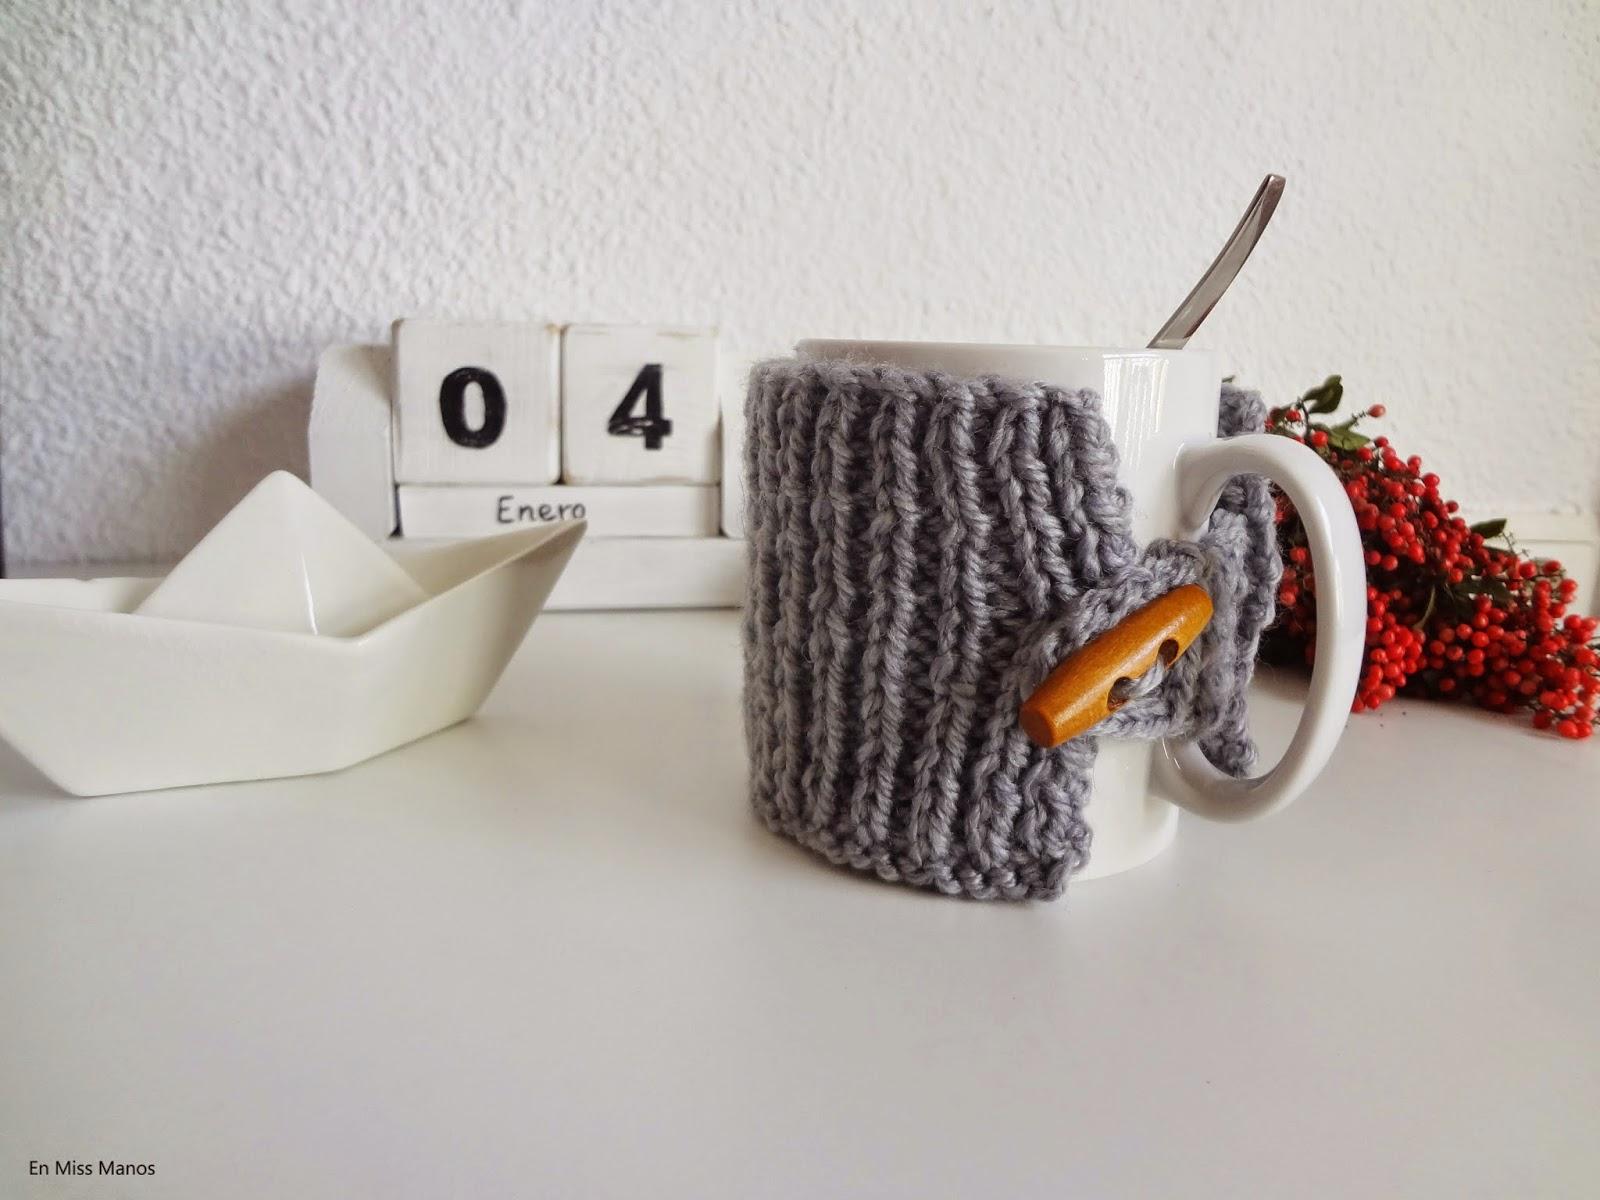 DIY Cubre tazas punto y ganchillo + tazas pintadas a mano - Handbox ...